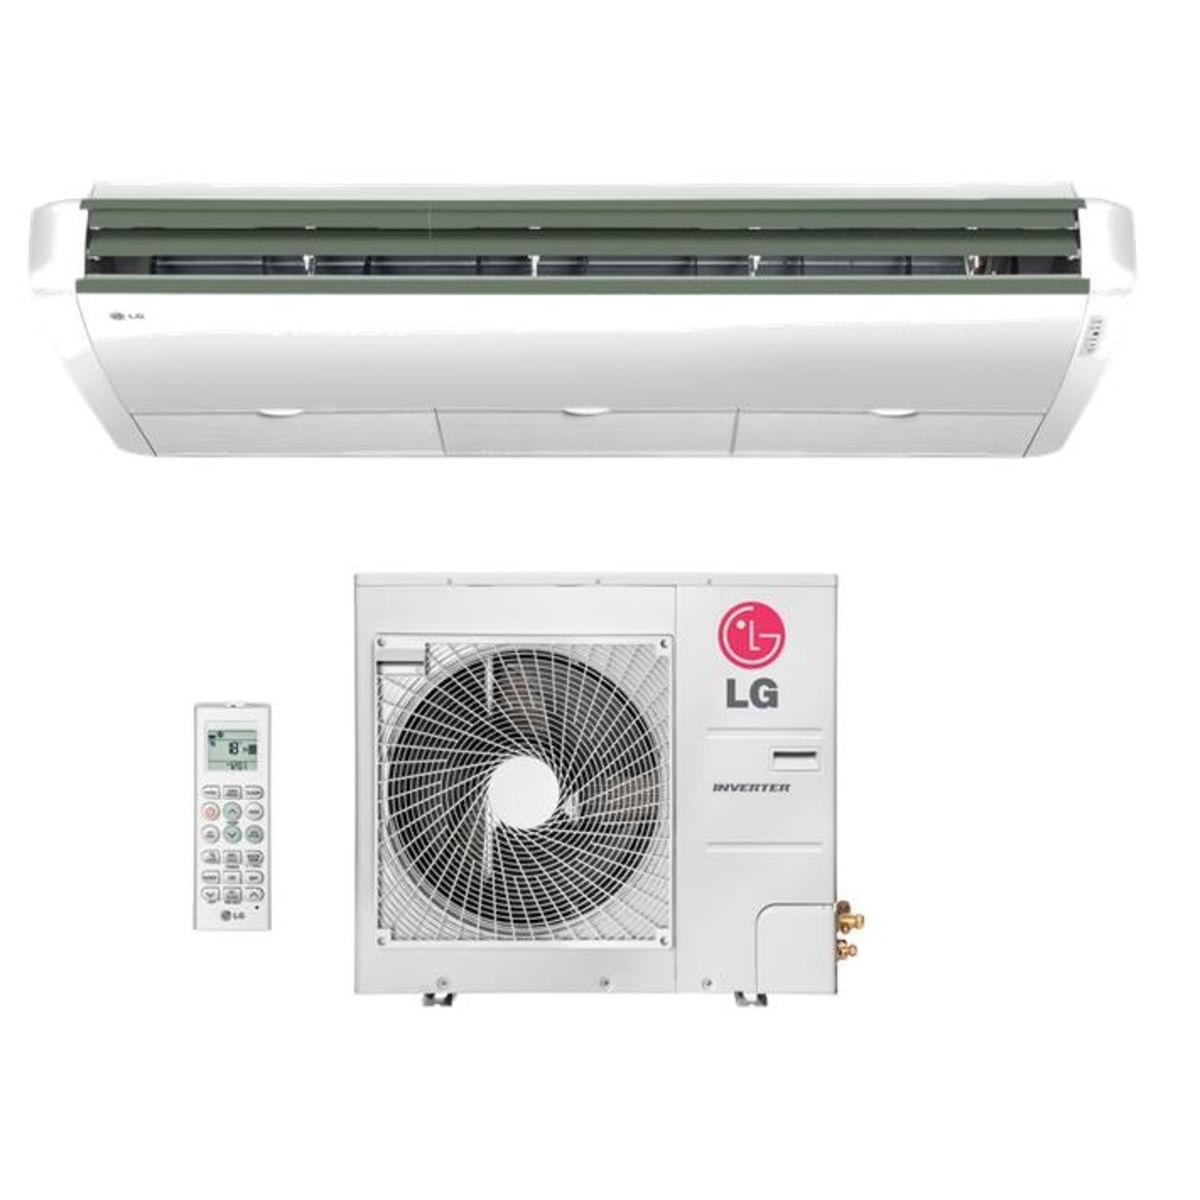 Ar-Condicionado-Split-LG-Teto-Inverter-35.000-BTU-h-Frio-AV-Q36GKLA0